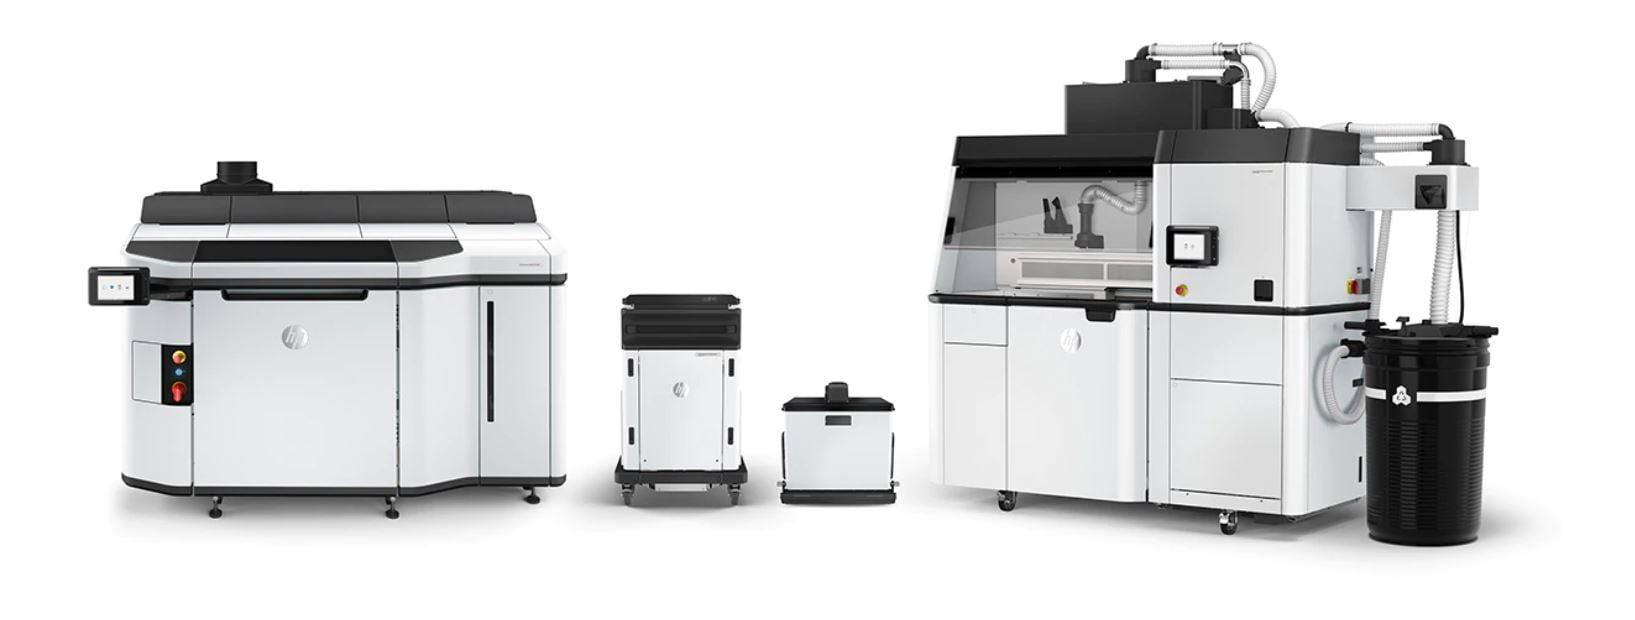 5200 Full Printing Solution